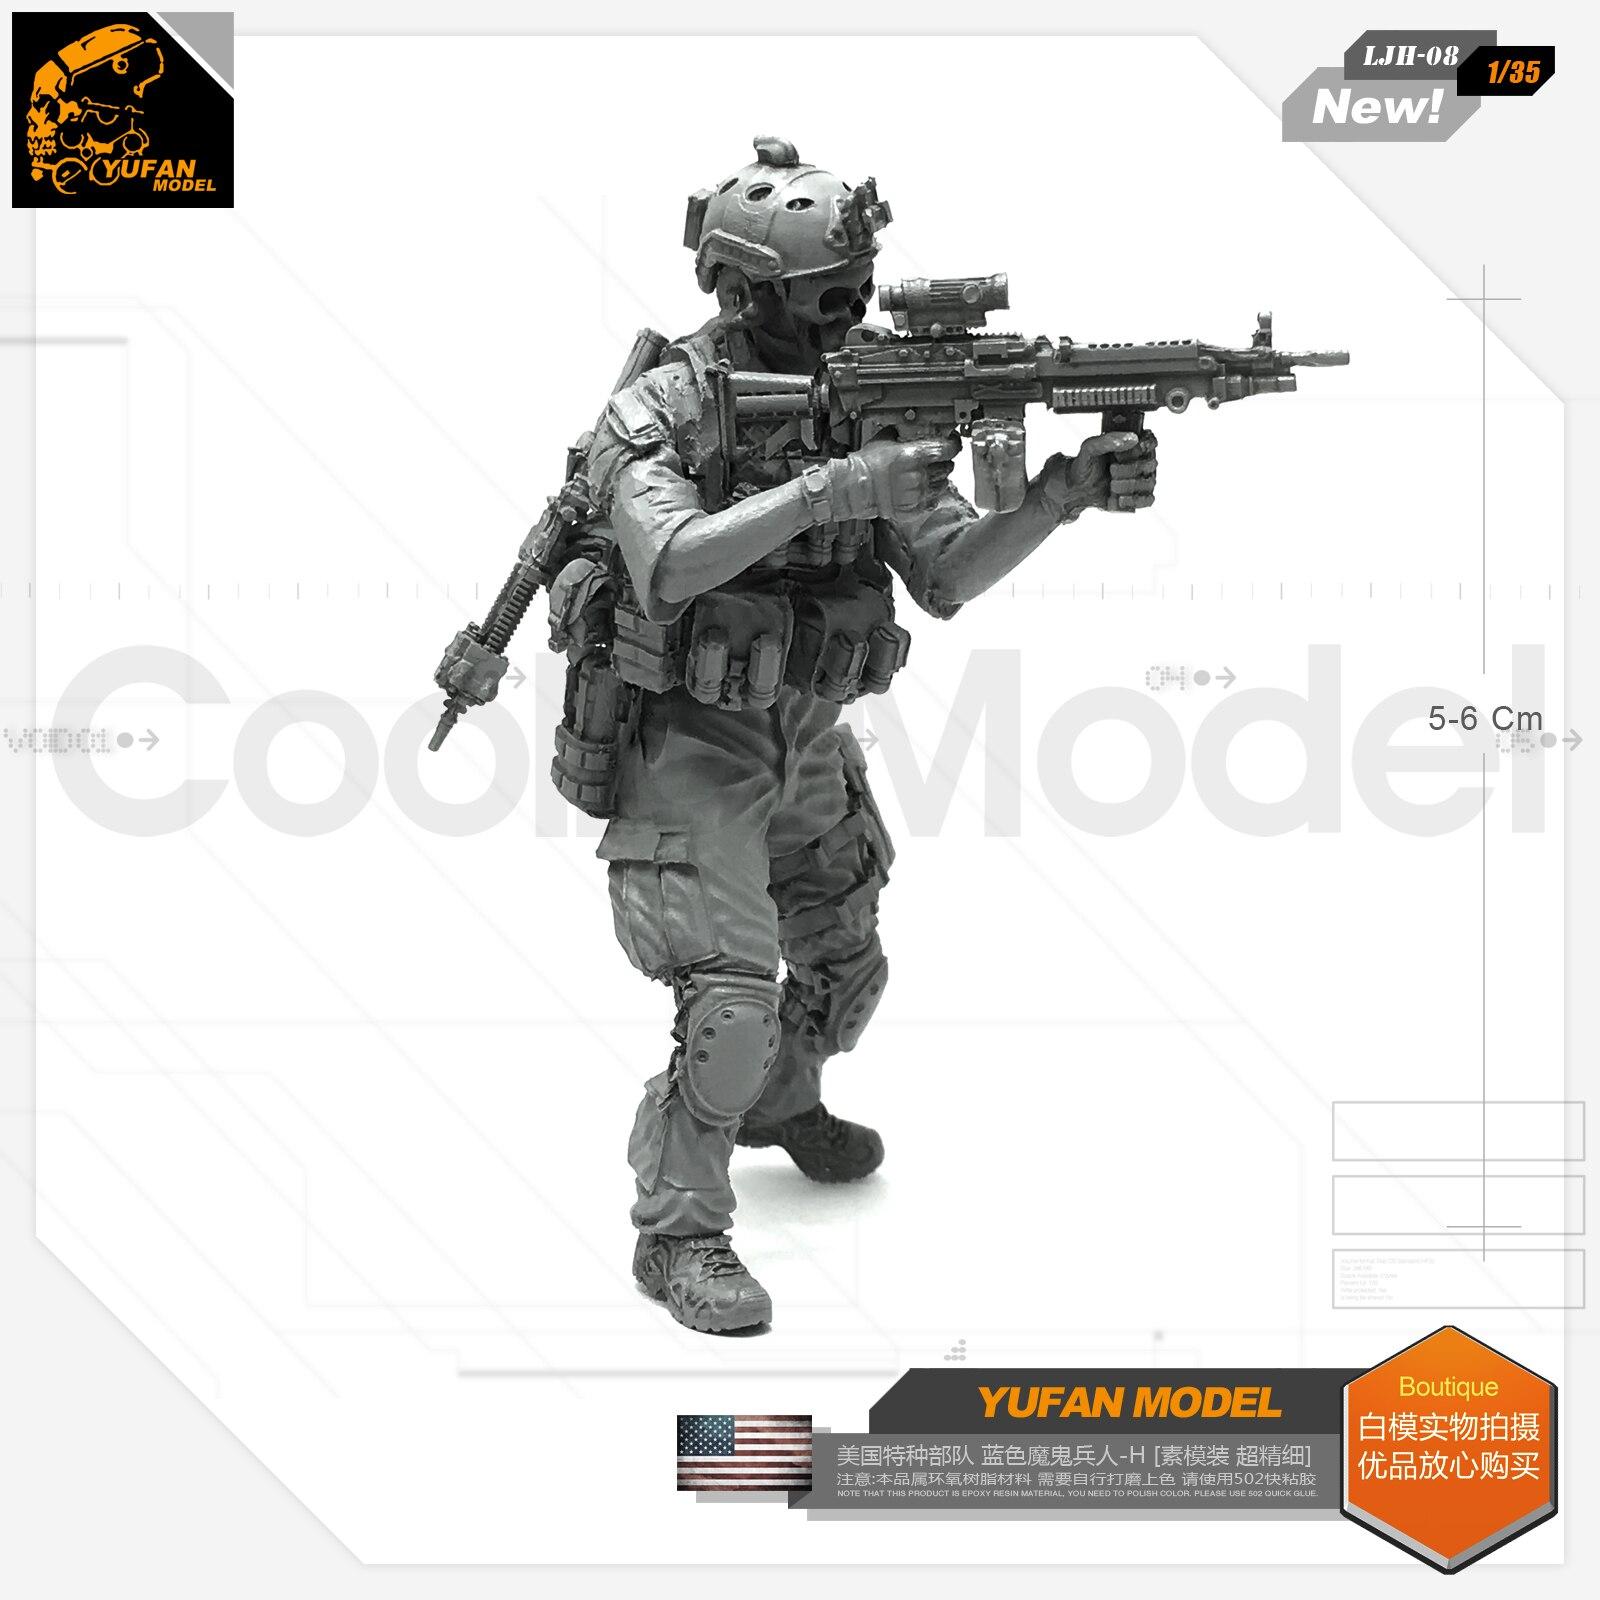 Yufan Model 1/35 Resin Figure Blue Devil Soldier-h Resin Model Ljh-08 For Us Special Forces  LJH-08